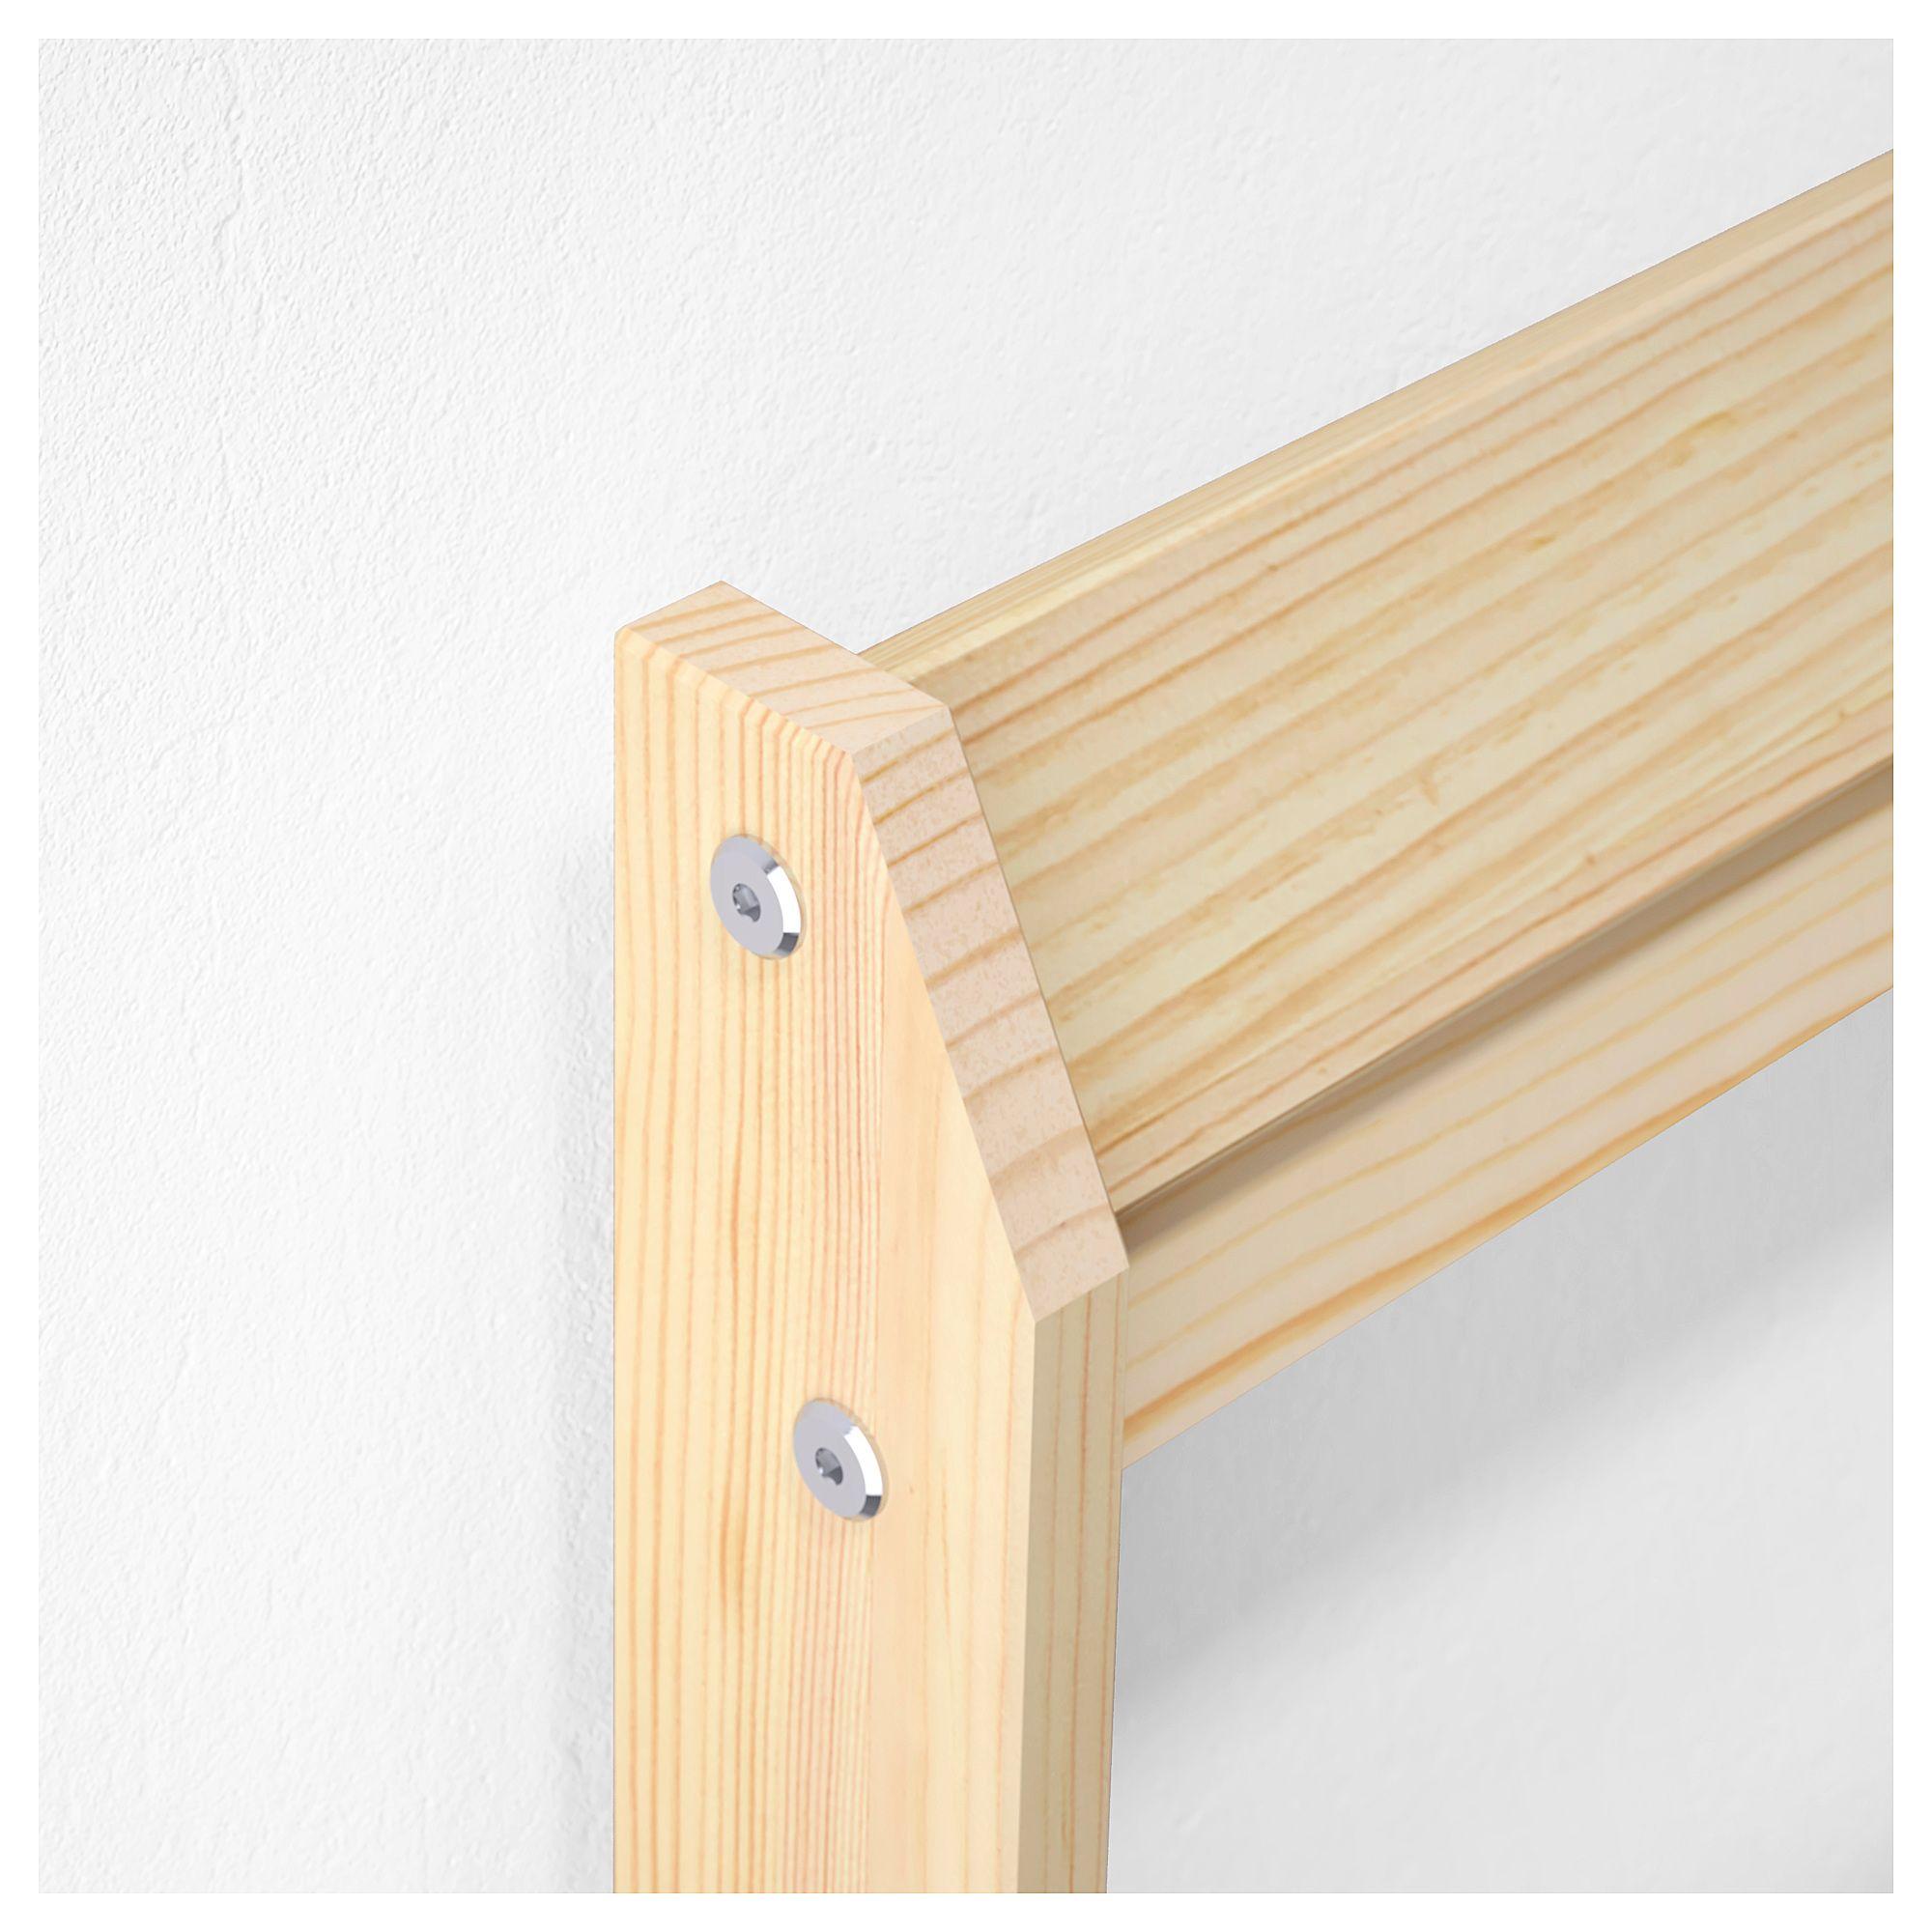 Ikea Us Furniture And Home Furnishings Ikea Bed Frames Ikea Bed Bed Frame